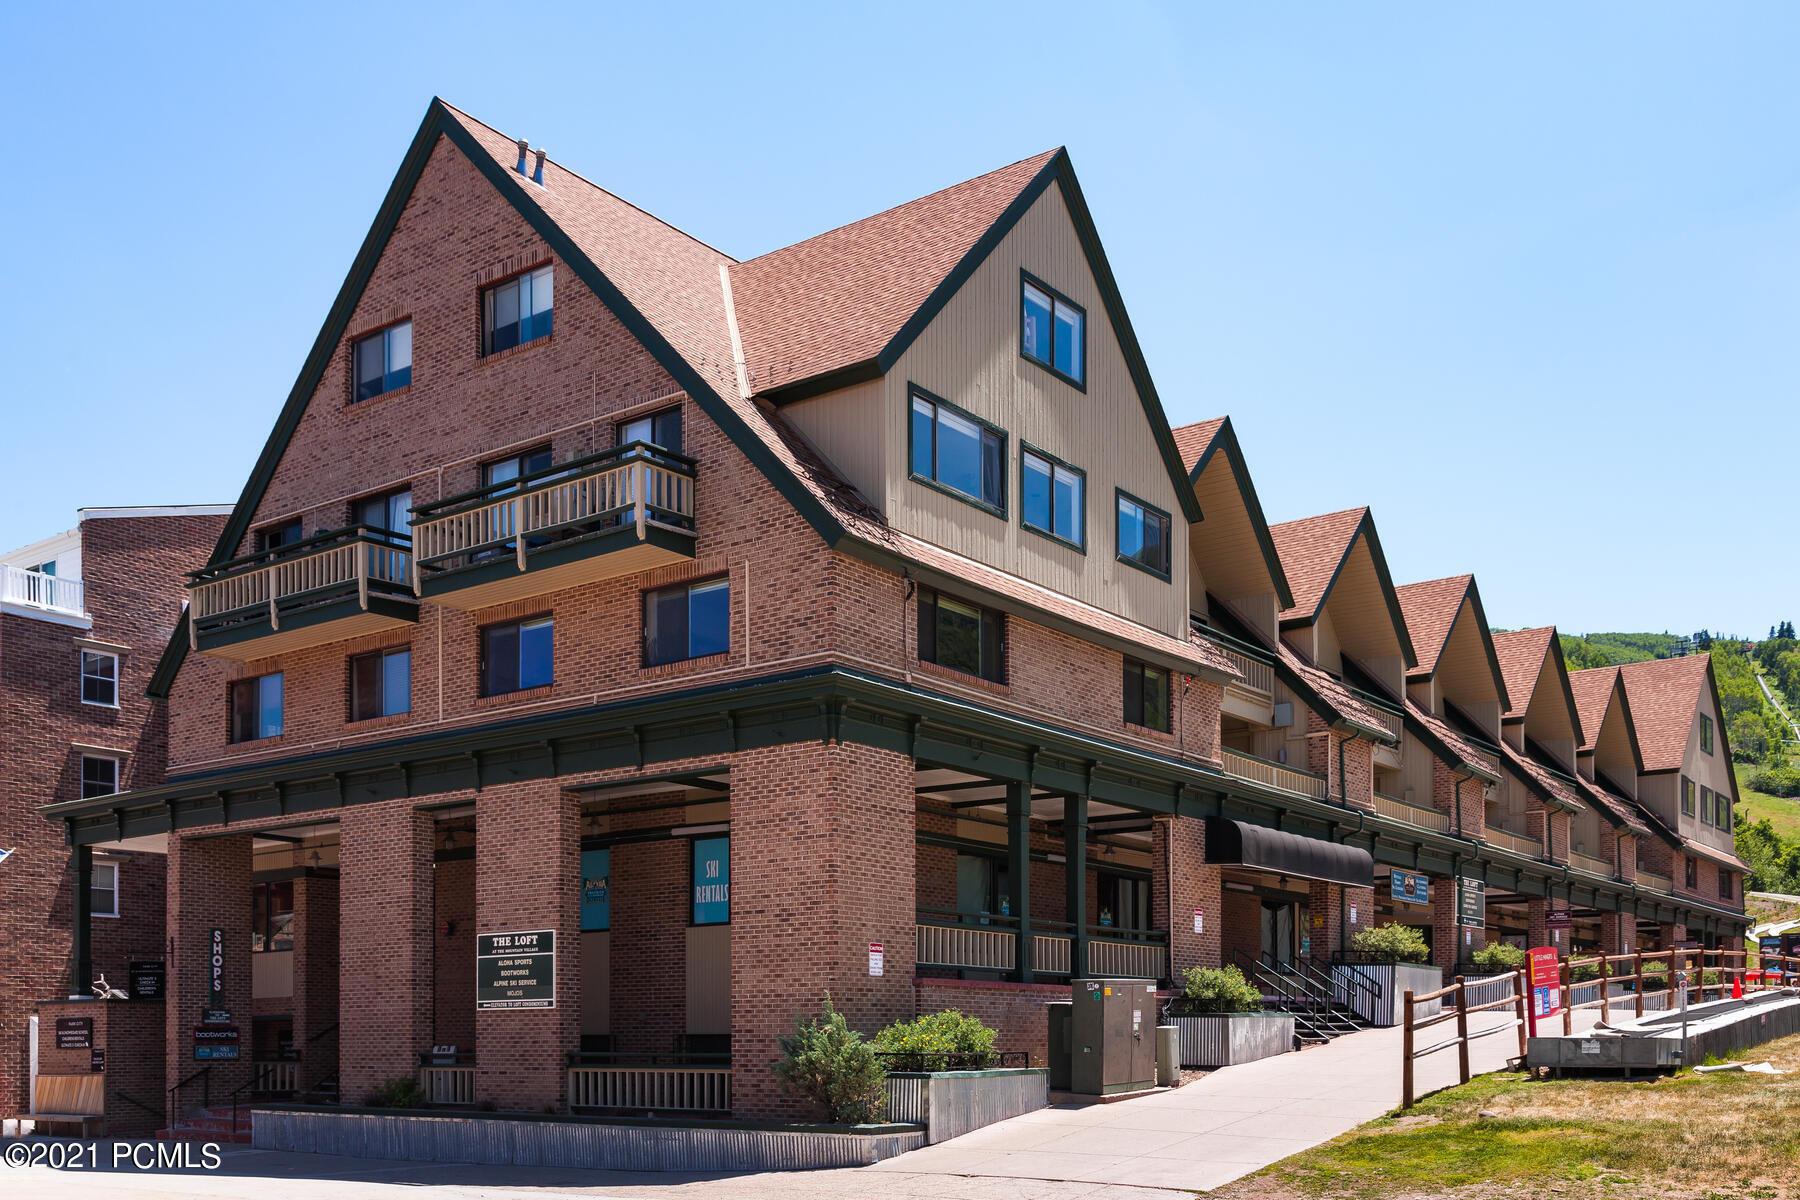 1401 Lowell Avenue, Park City, Utah 84060, 3 Bedrooms Bedrooms, ,3 BathroomsBathrooms,Condominium,For Sale,Lowell,12101475